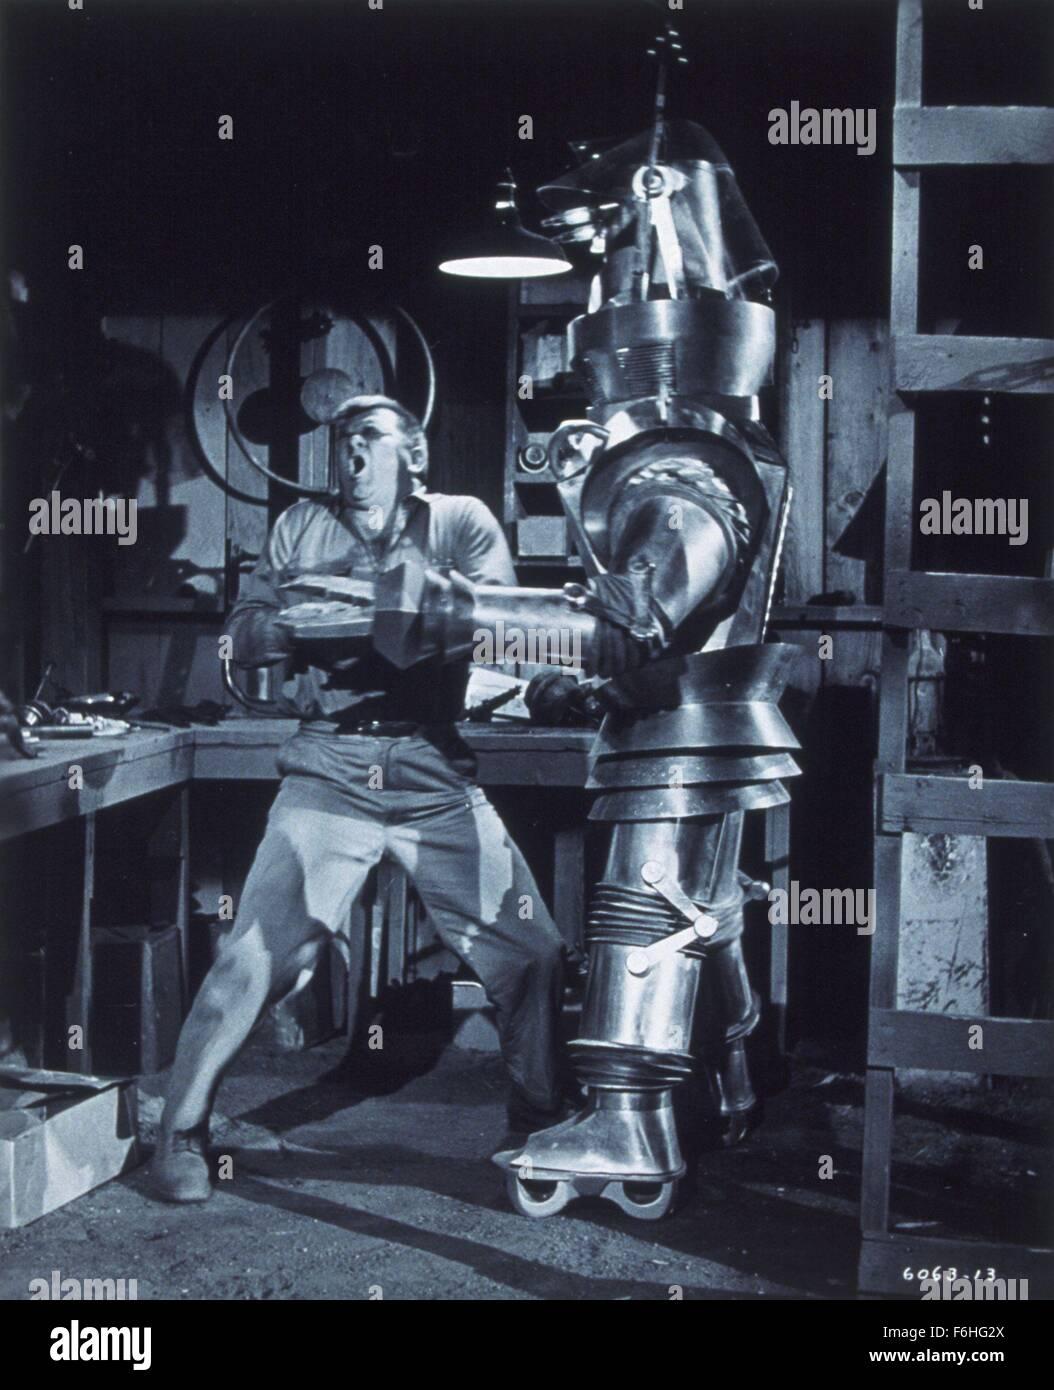 1954, Film Title: TOBOR THE GREAT, Director: LEE SHOLEM, Studio: REPUBLIC, Pictured: ROBOTS-ANDROIDS-CYBORGS-CLONES, - Stock Image